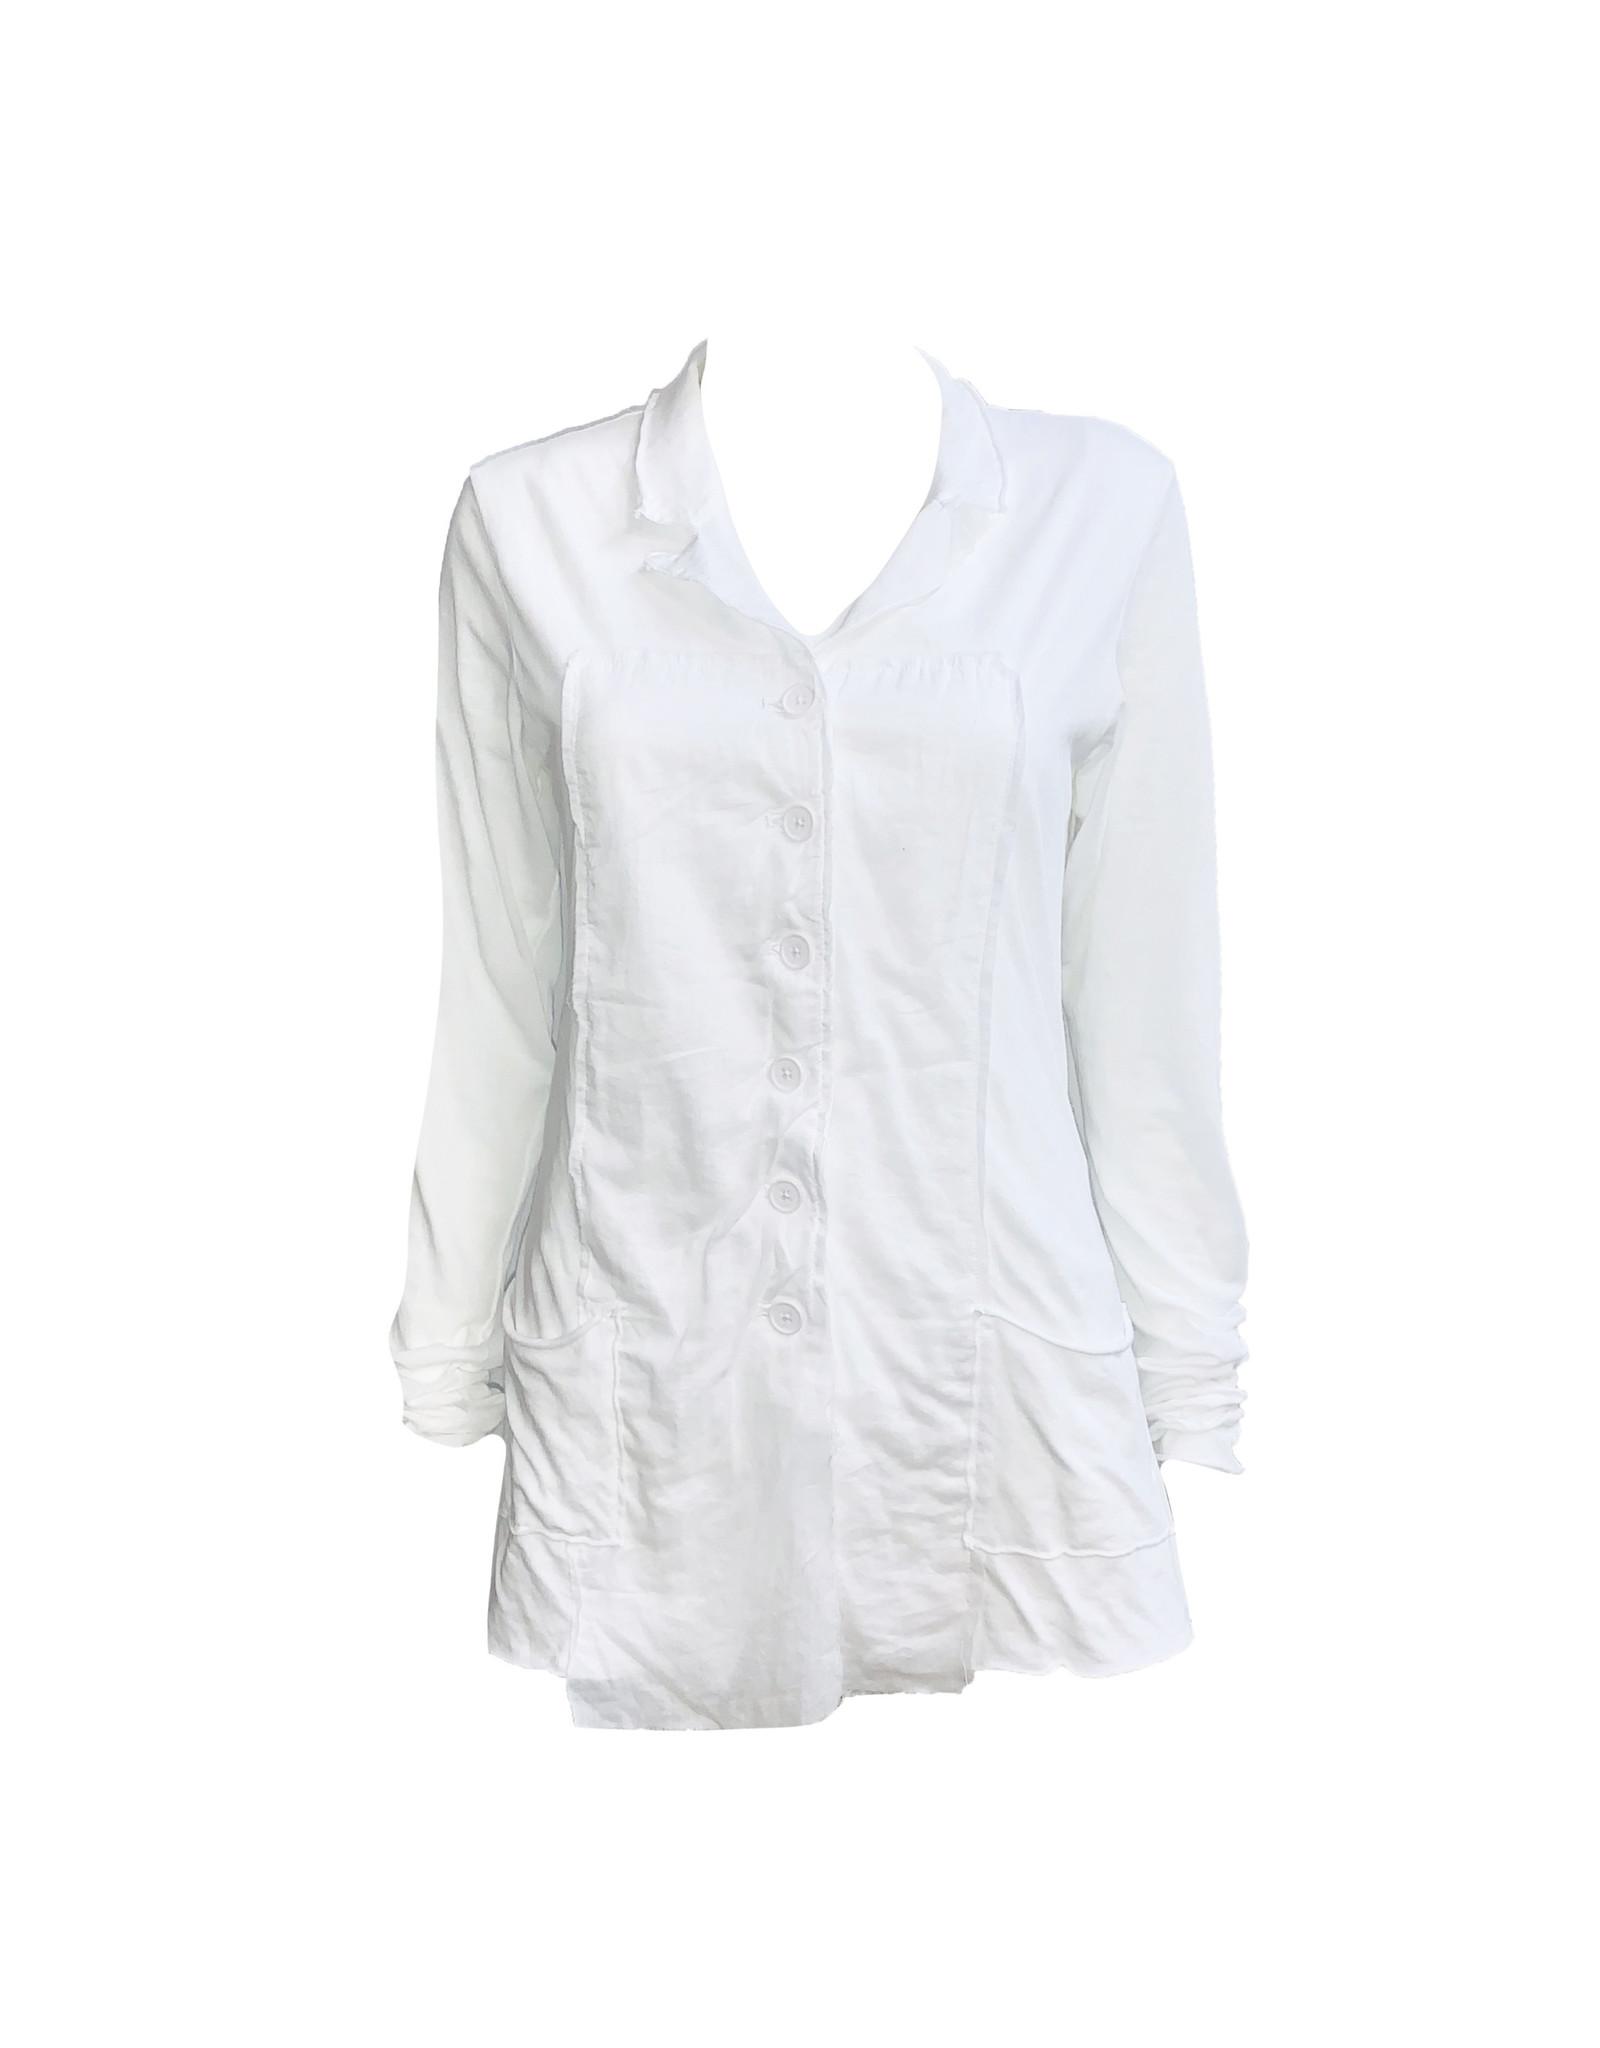 Studio Rundholz Studio Rundholz Button Front Jacket-White